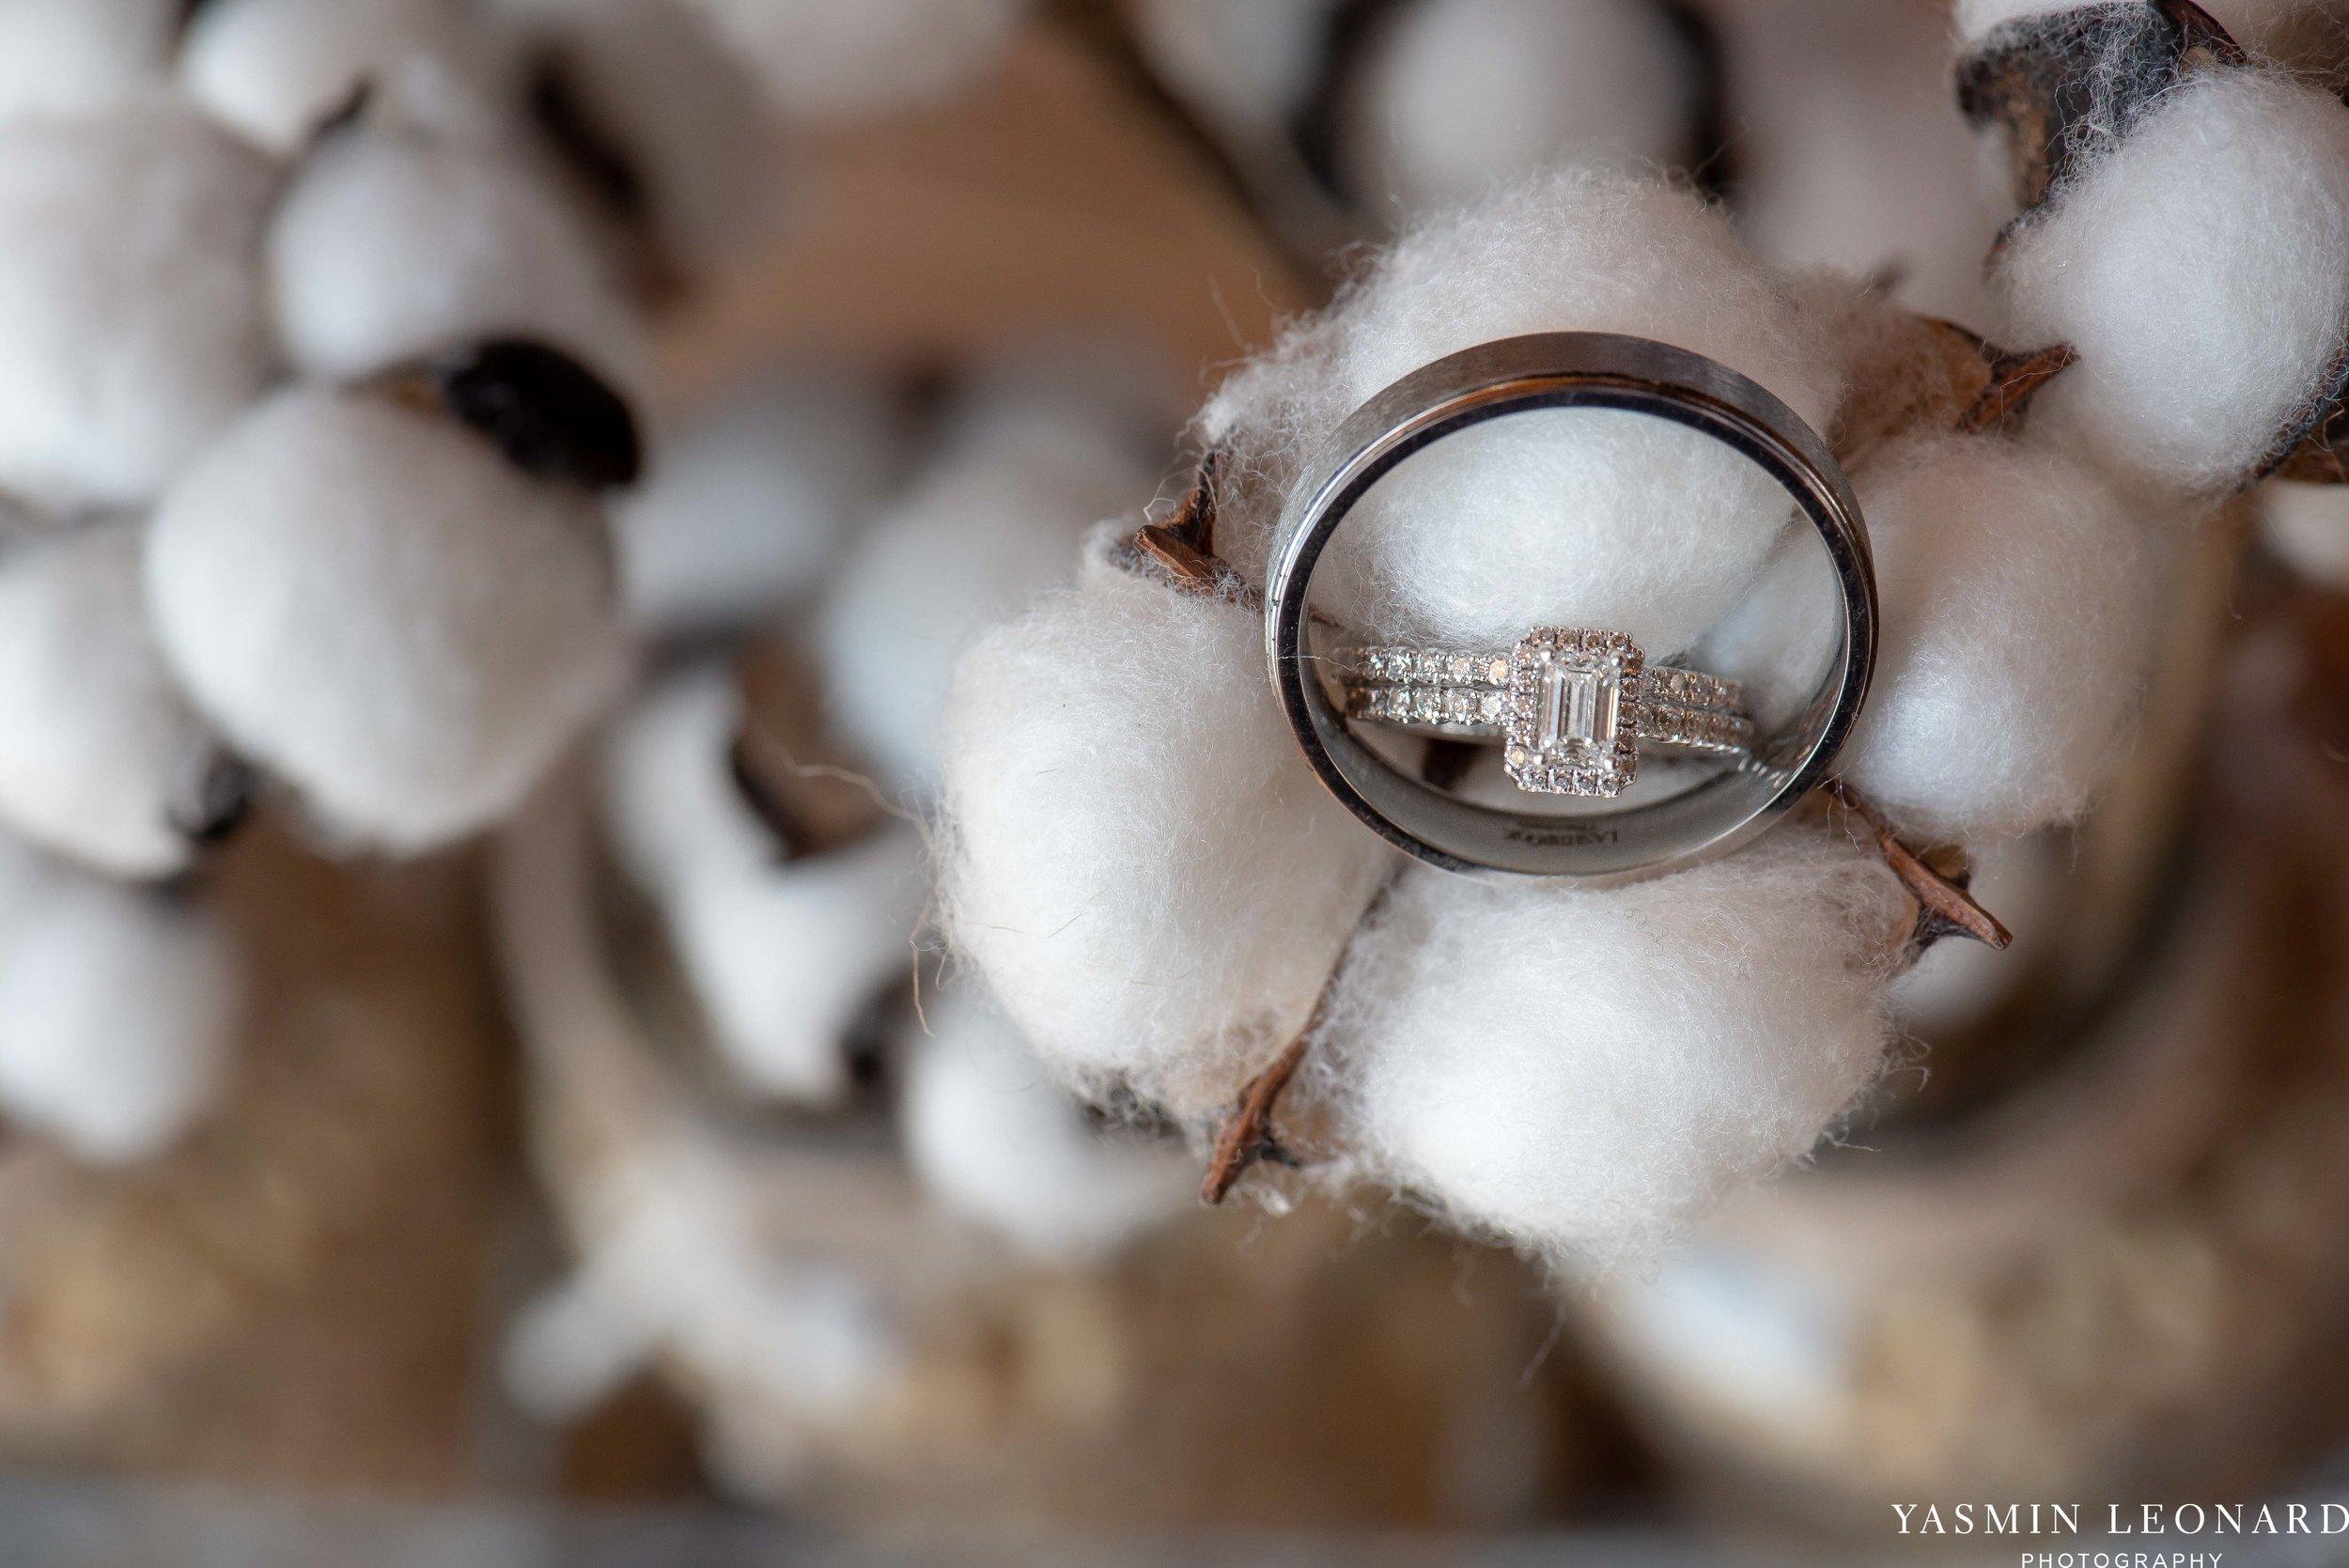 The Barn at Heritage Farm - Country Wedding - Pink and Blue Wedding - Barn Wedding - Outdoor Wedding - Cotton and Wheat Decor - Groom in Bibs - Pink Bridal Colors - Yasmin Leonard Photography-3.jpg